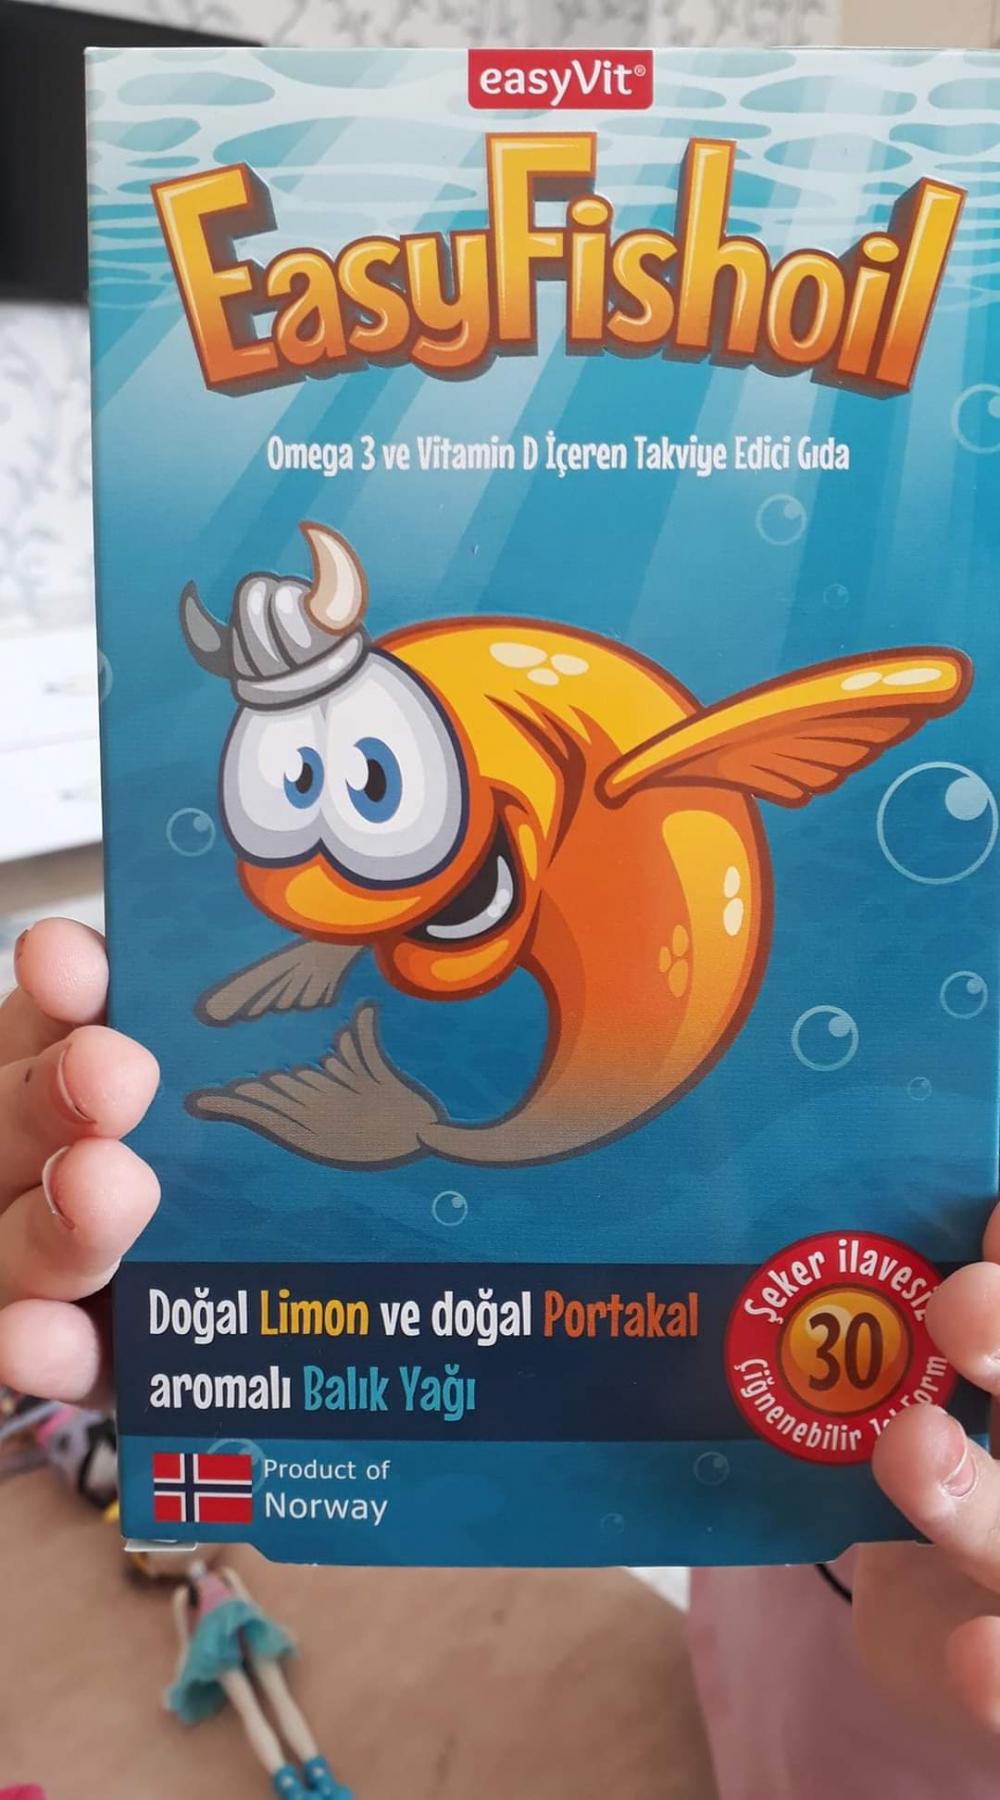 Easy fish oil kullanan var mı